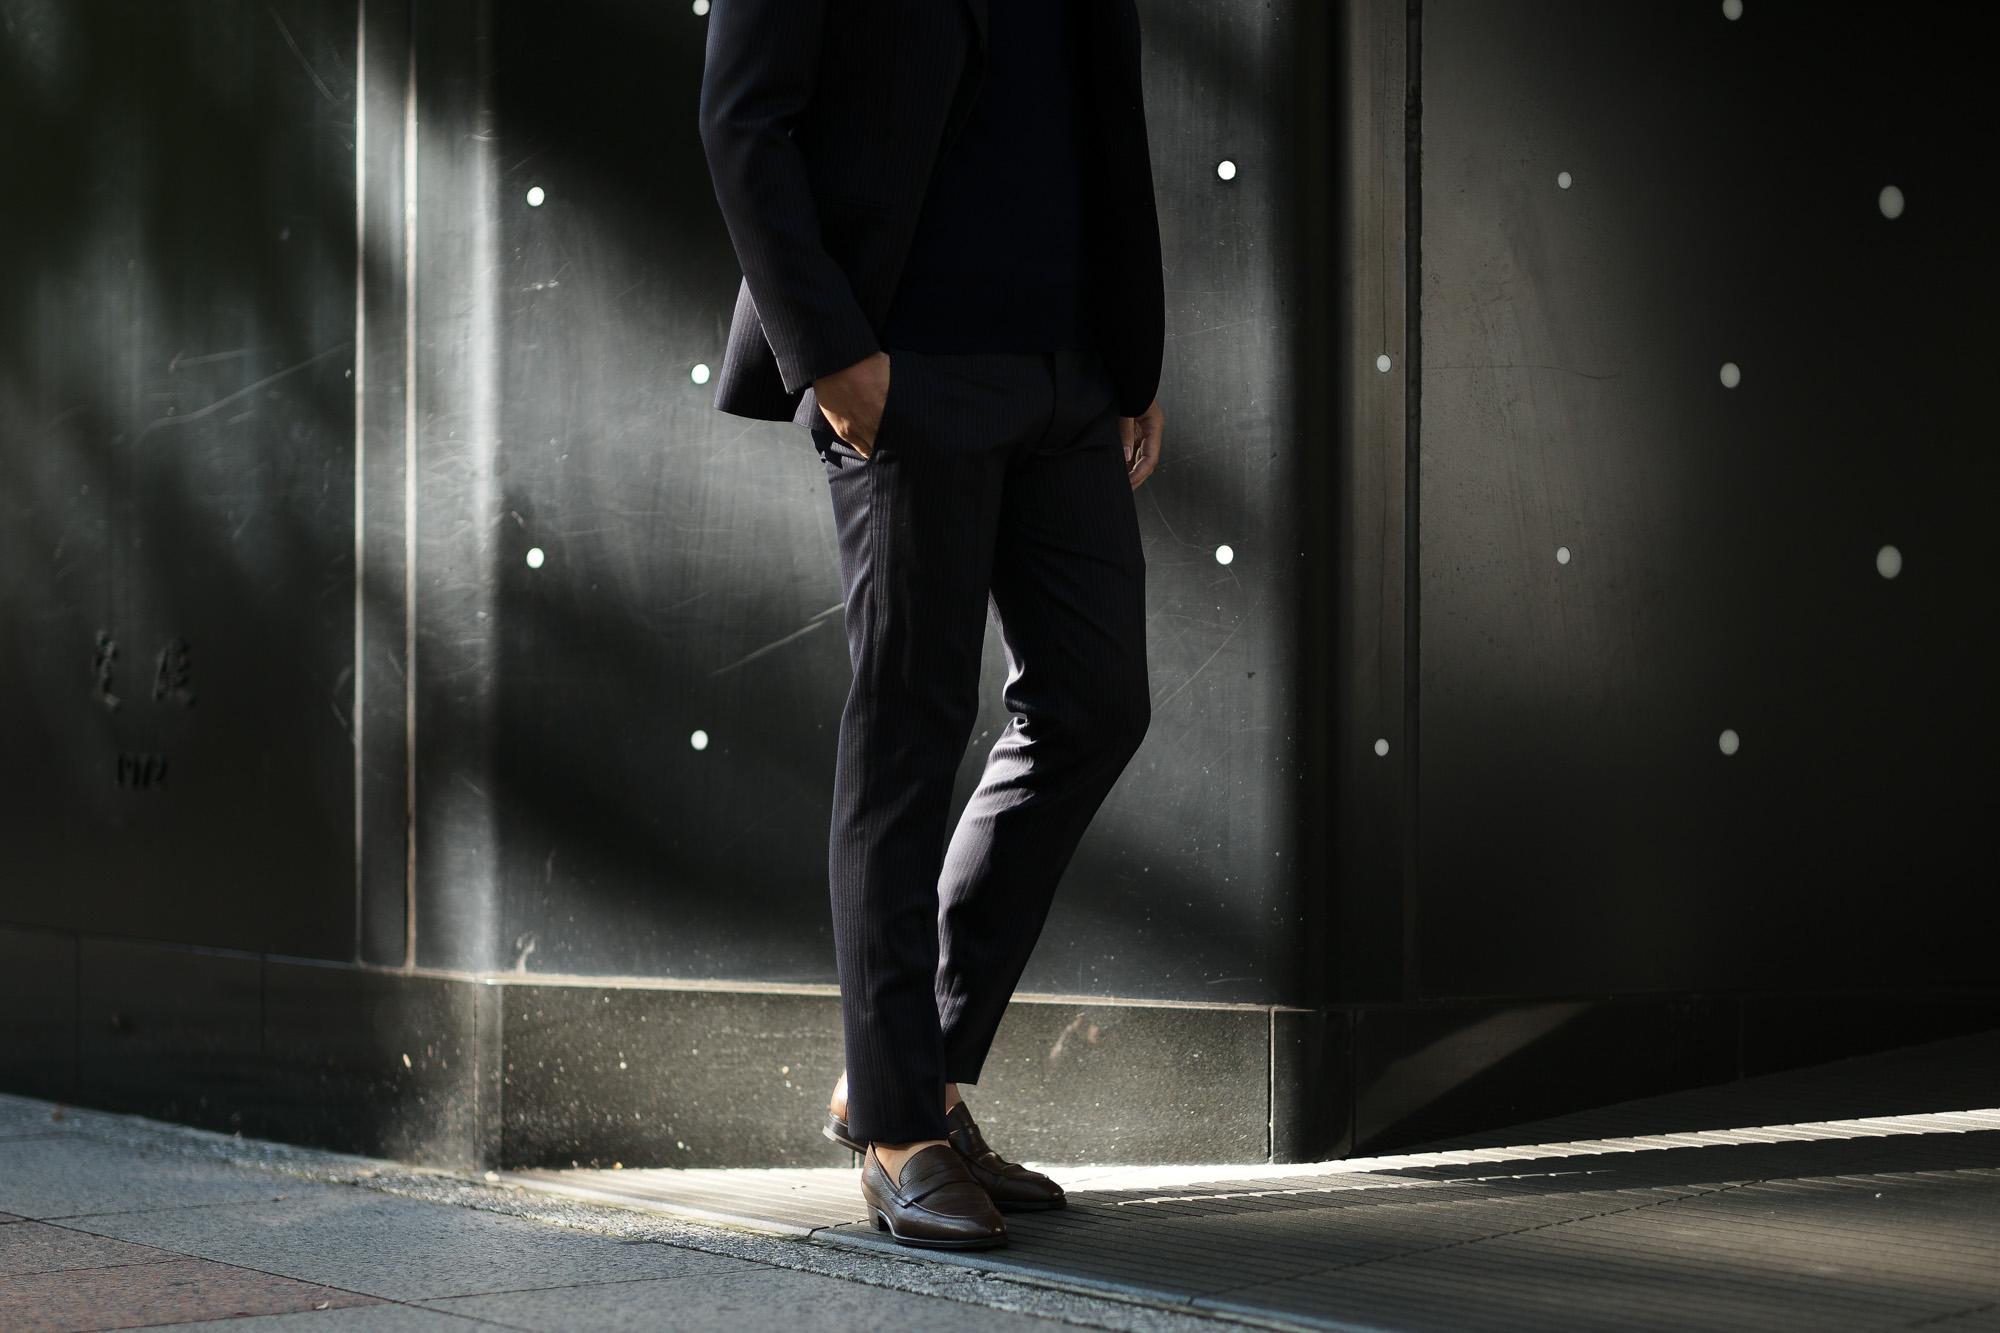 cuervo bopoha(クエルボ ヴァローナ) Sartoria Collection (サルトリア コレクション) Rooster (ルースター) LANVIN (ランバン) ストライプ スーツ NAVY (ネイビー) MADE IN JAPAN (日本製) 2020 【ご予約受付中】 愛知 名古屋 altoediritto アルトエデリット オーダースーツ ゼニアスーツ